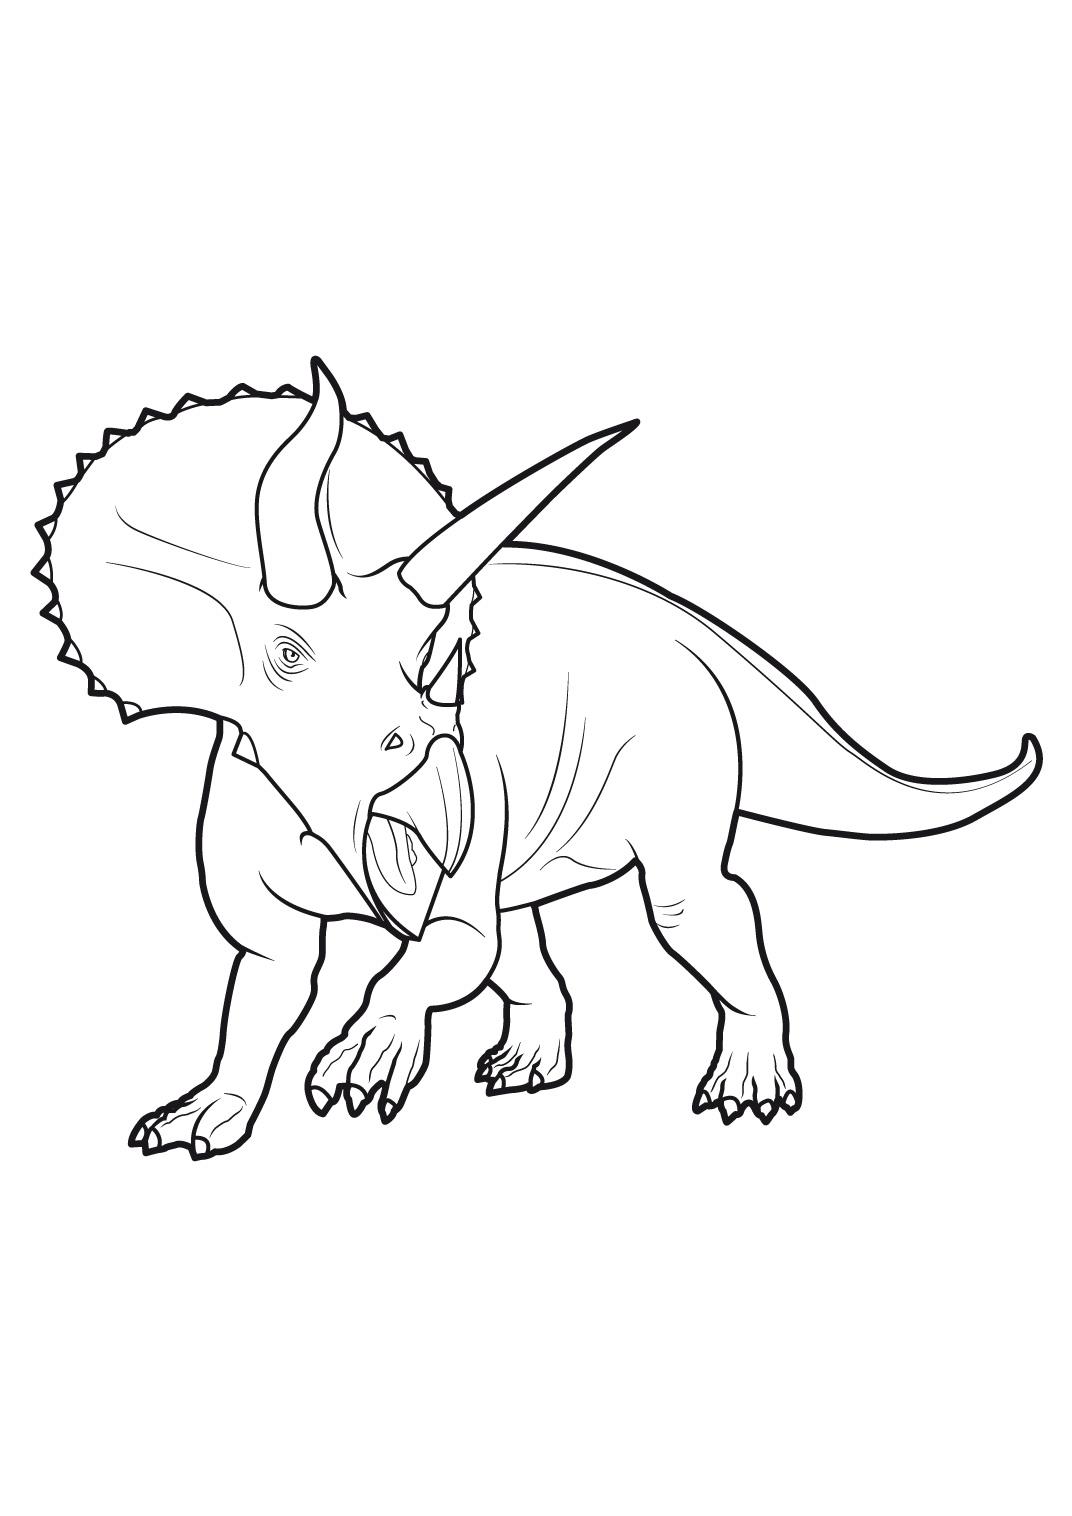 Dinosaur King Gabu Colouring Pages Page 2